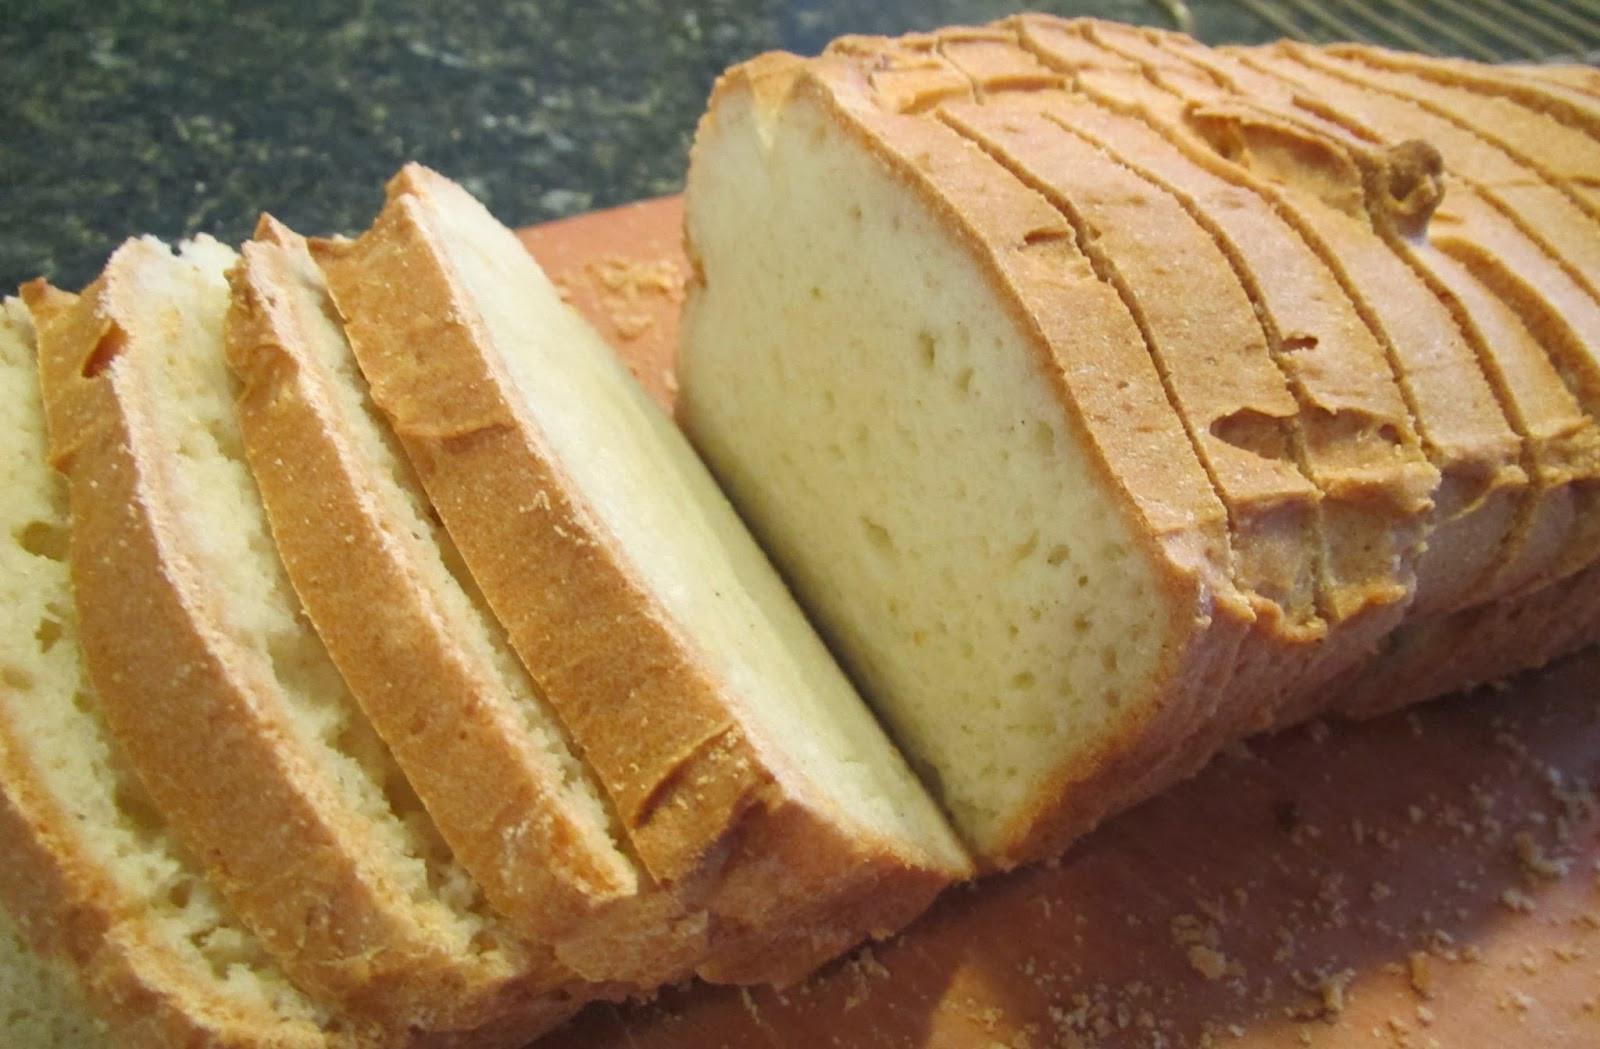 Gluten Free Sourdough Bread  Successfully Gluten Free Gluten Free White Sourdough Bread